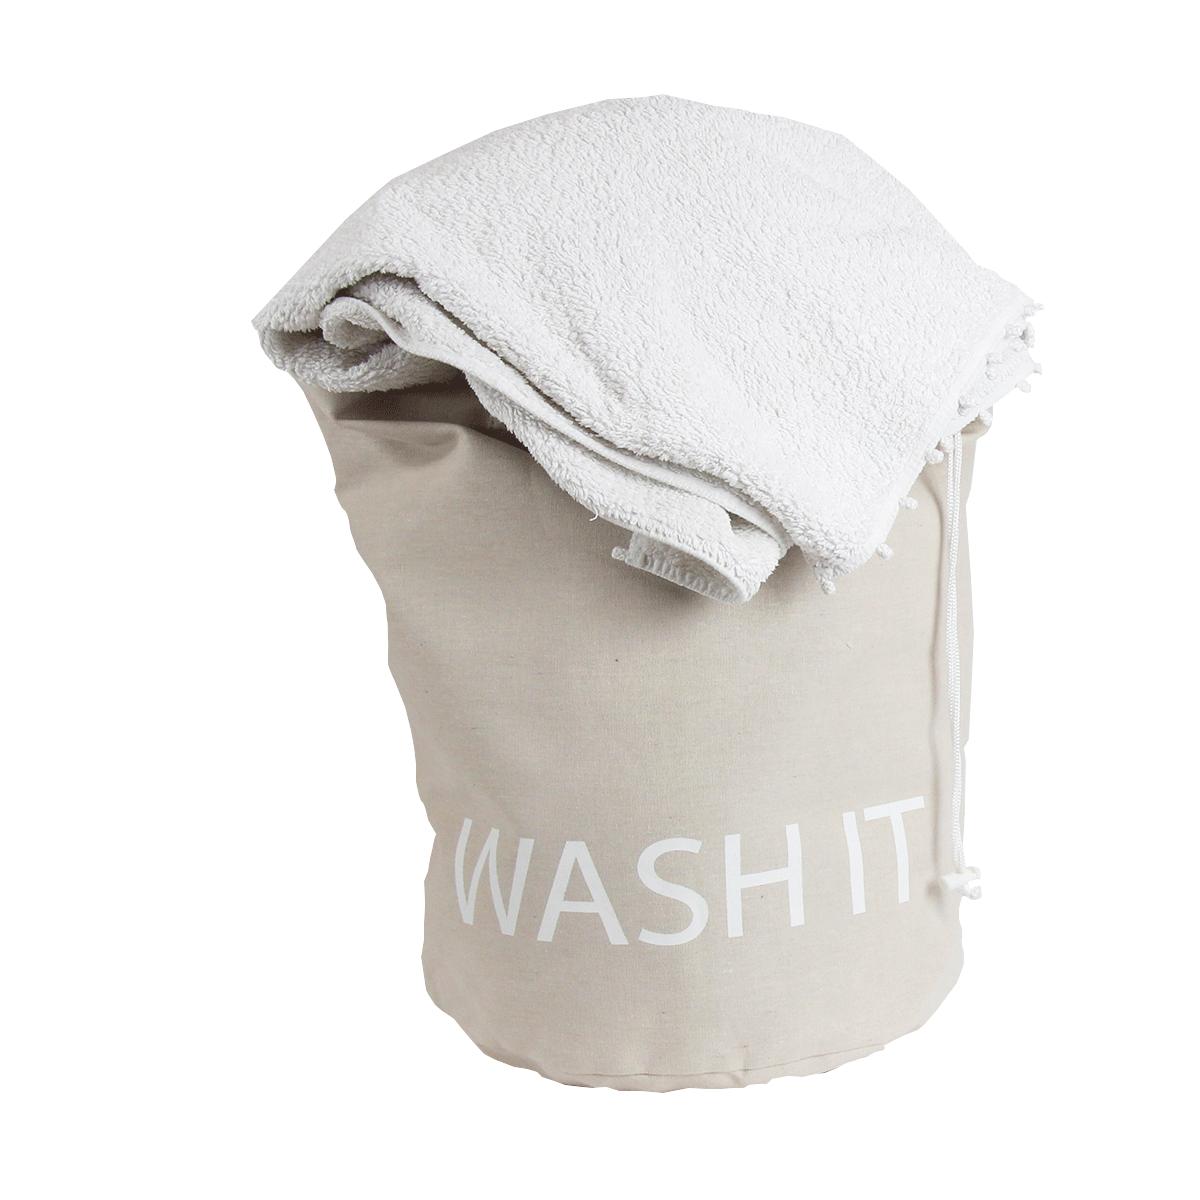 Sac linge sale en tissu beige clair - Sac a linge sale tissu ...